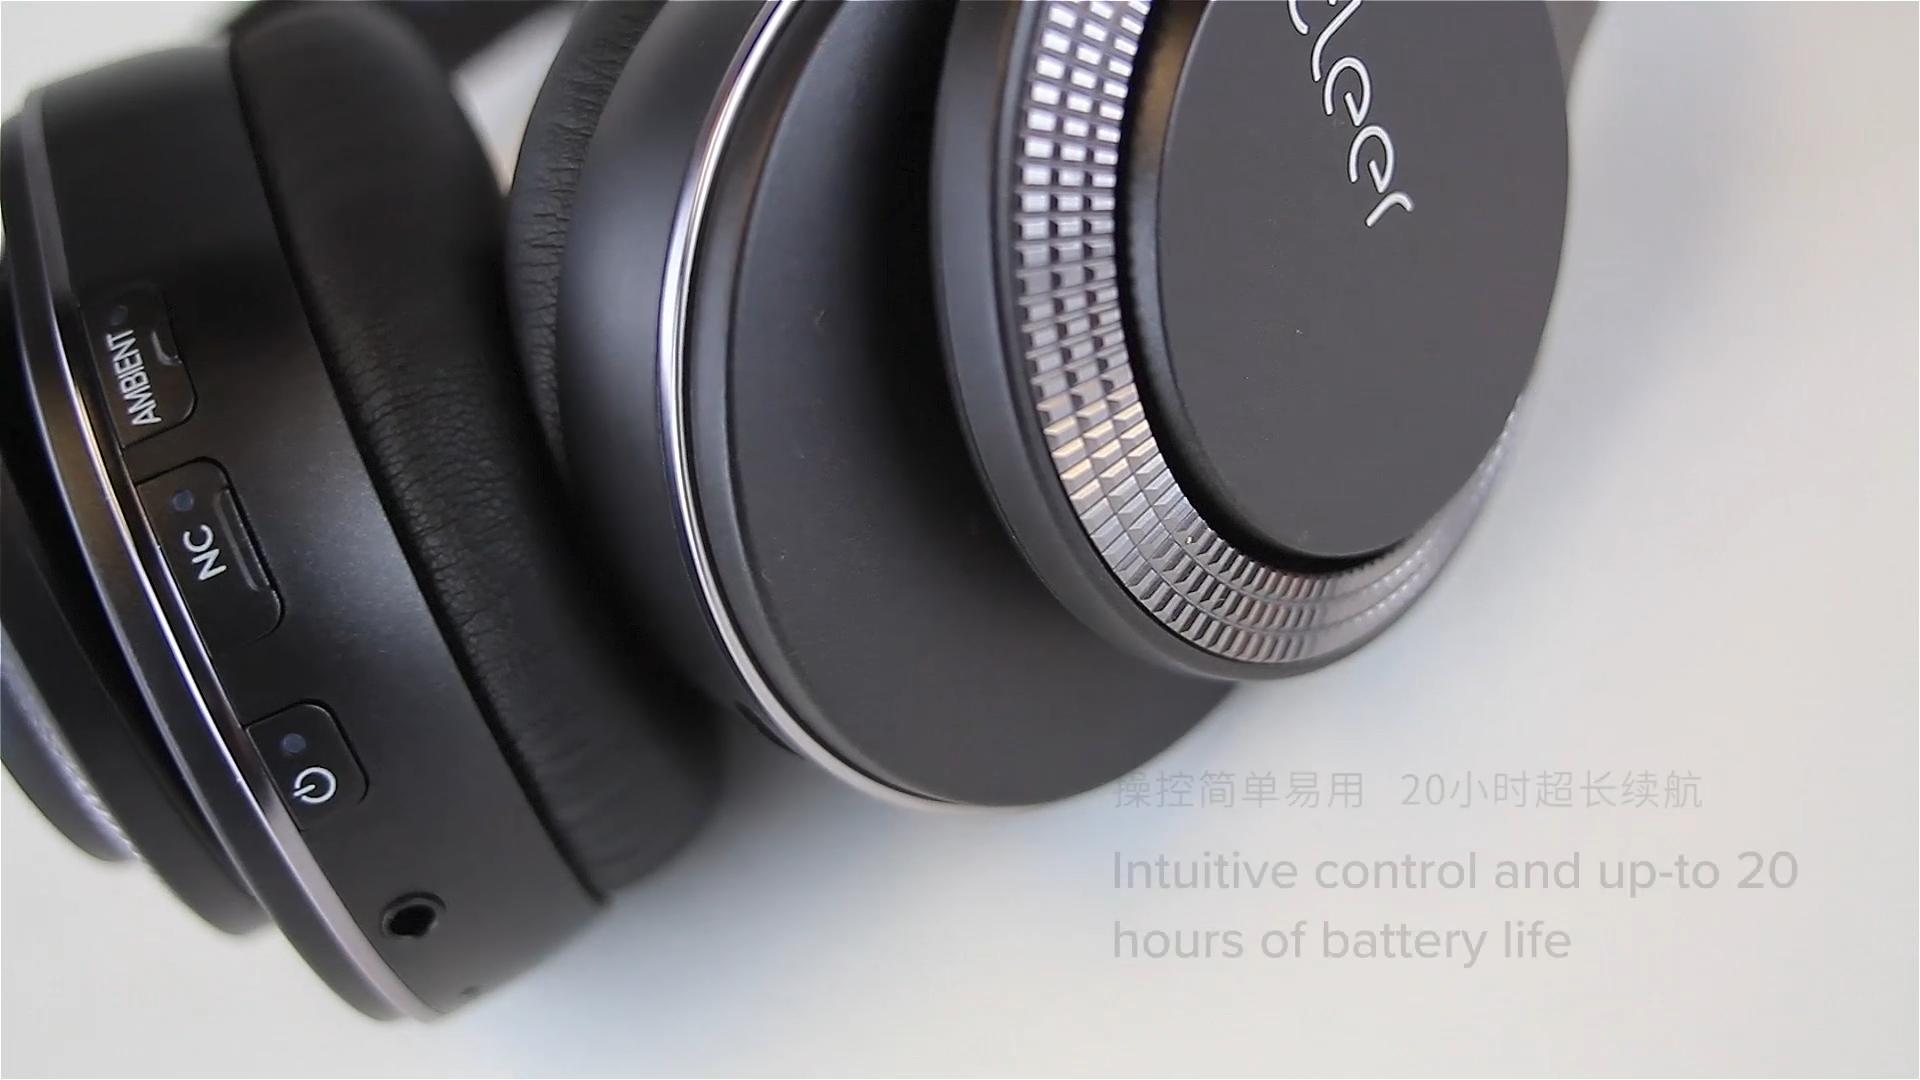 OEM-FLOW CSR8675 Wireless Bluetooth Hybrid Active Noise Cancelling Headphones Wireless Over Ear Bluetooth Headphones